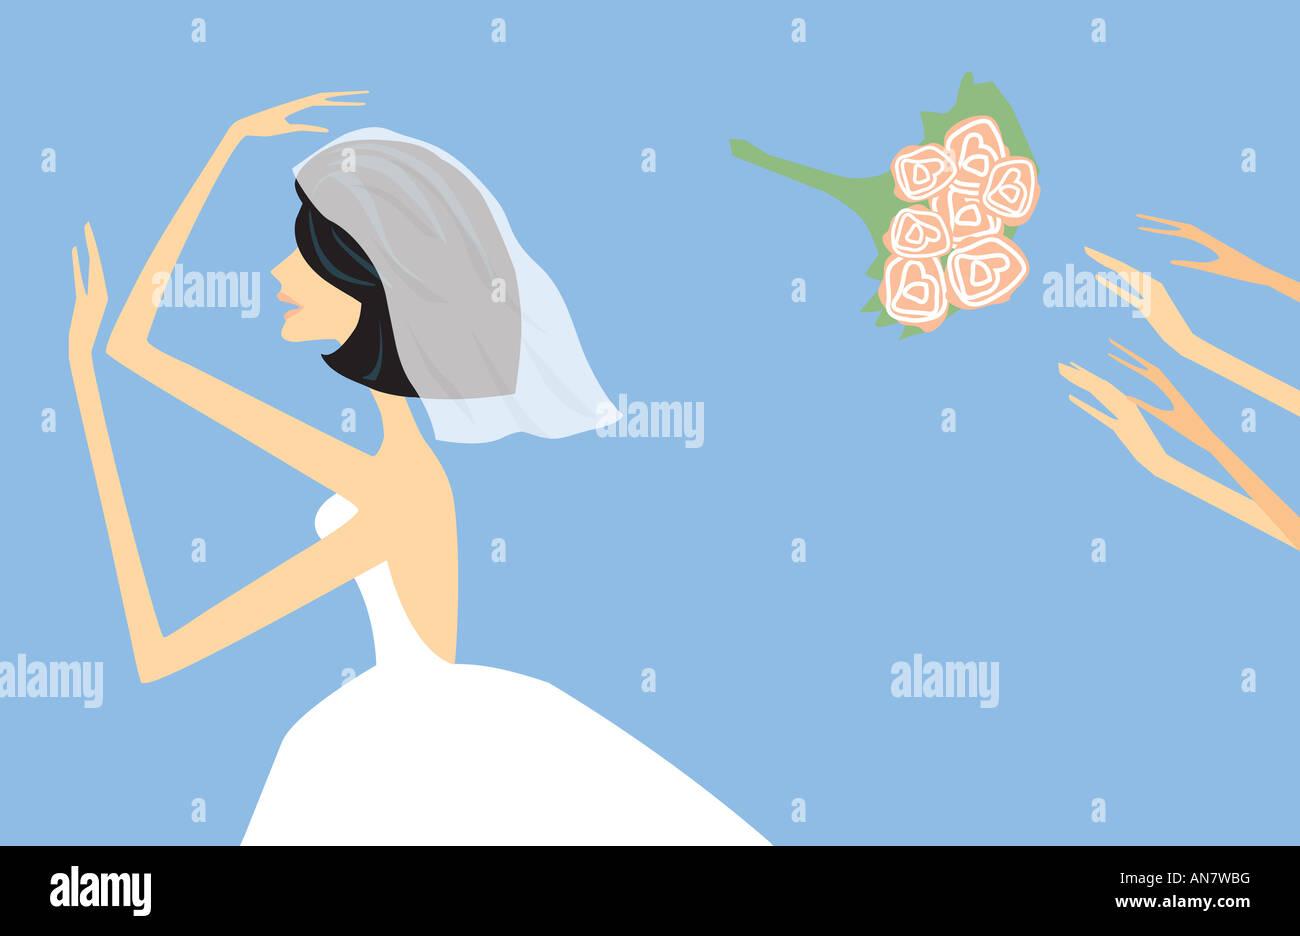 Catching the bridal wedding bouquet - Illustration Stock Photo